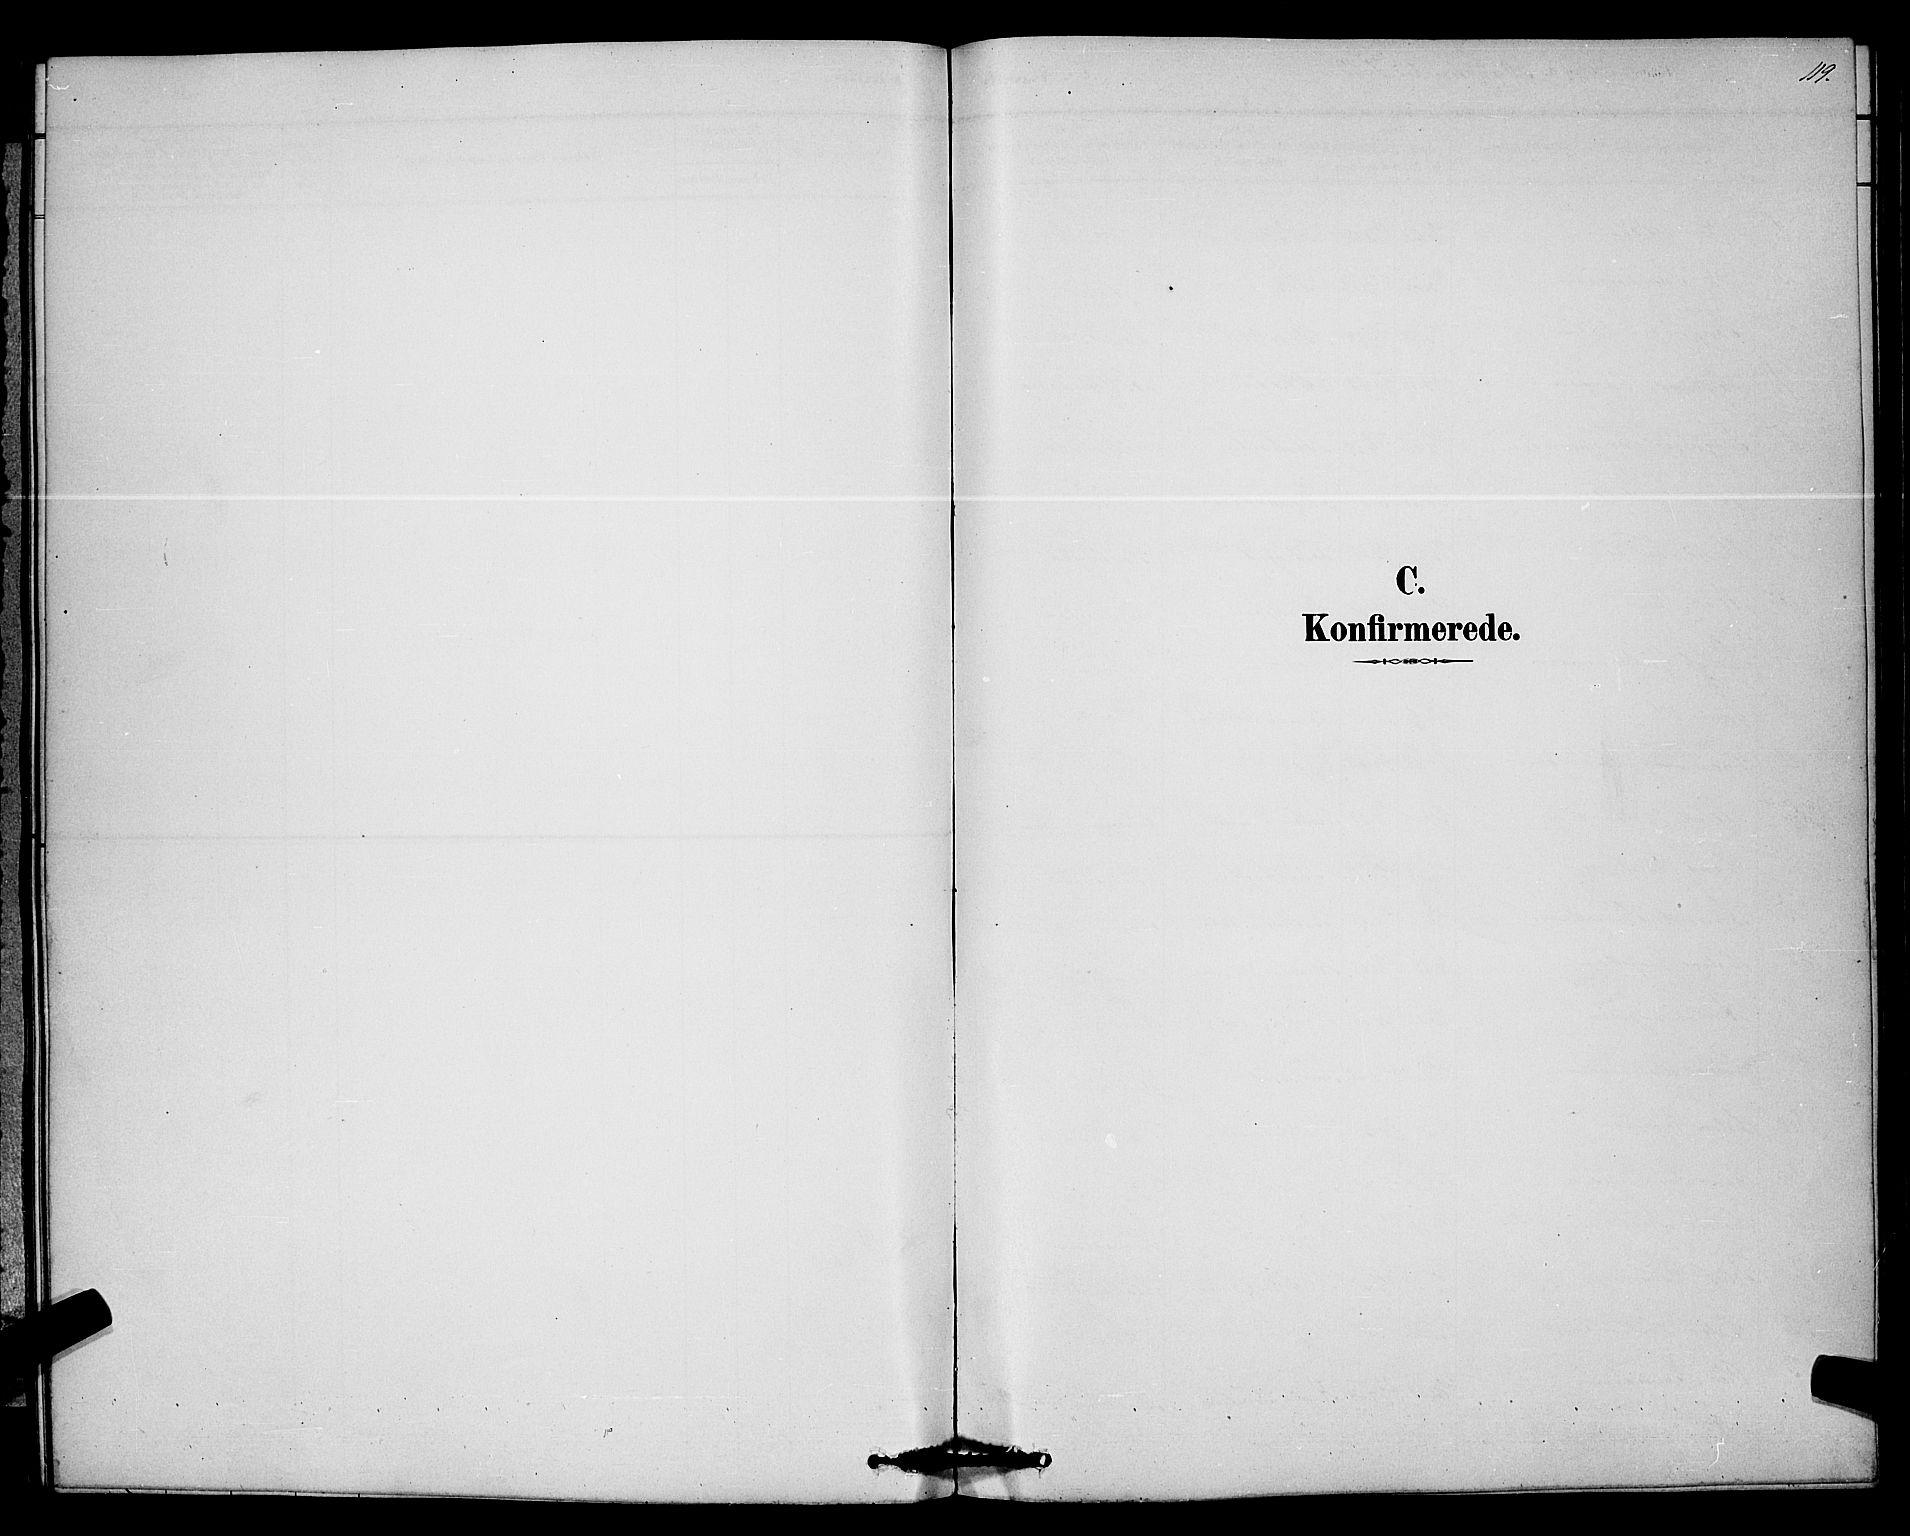 SAKO, Bø kirkebøker, G/Ga/L0005: Klokkerbok nr. 5, 1883-1897, s. 119